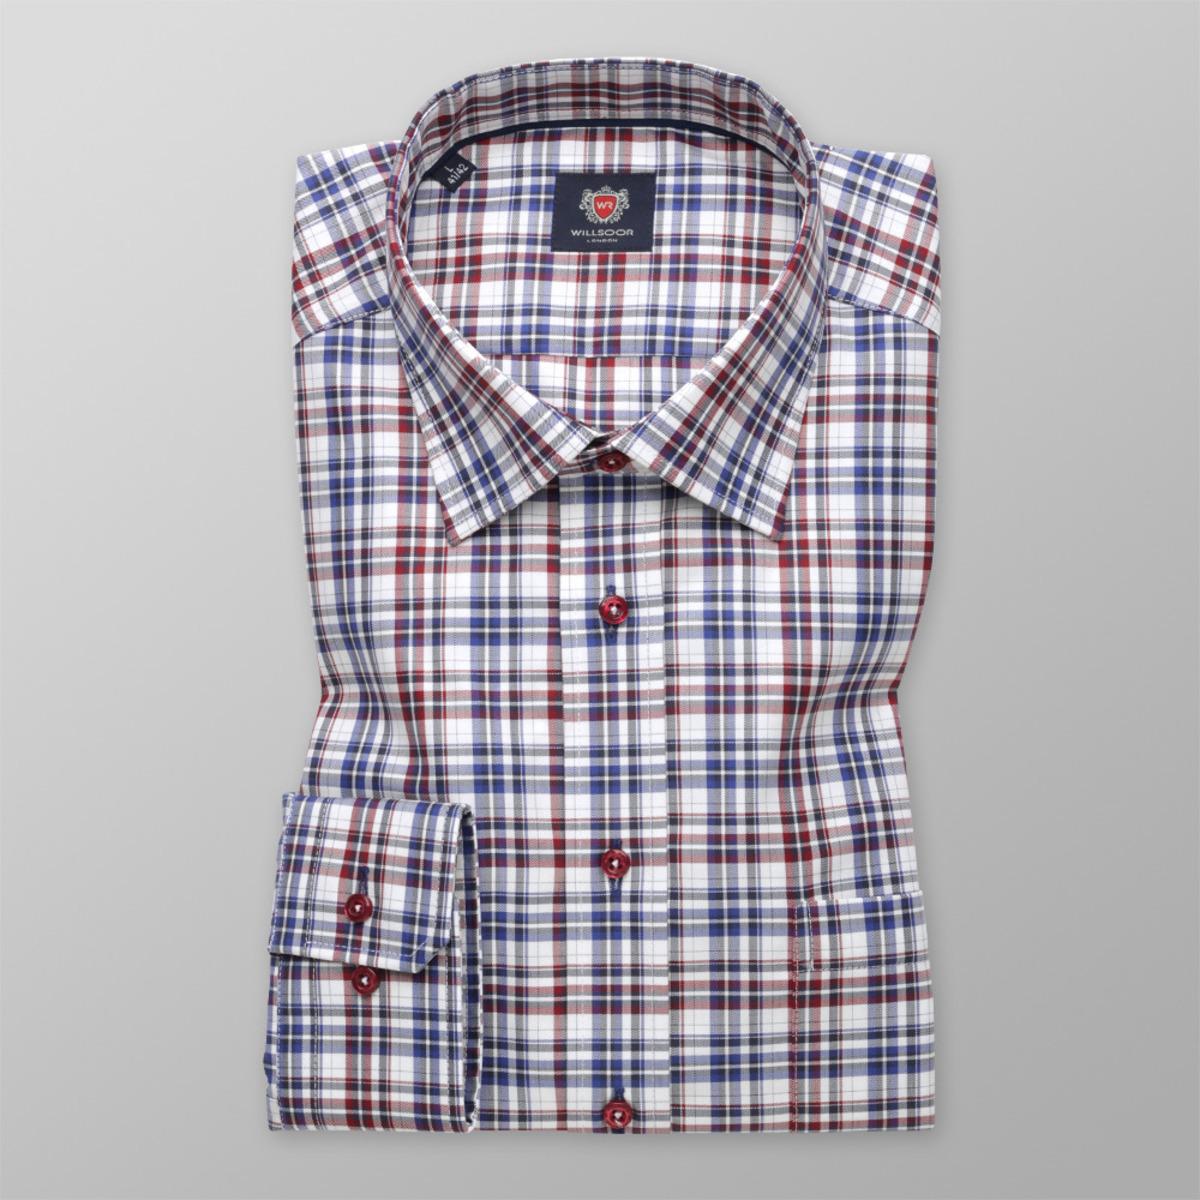 debd2a3172e Pánská košile London (výška 176-182) 9611 Slim Fit kostkovaná 176-182